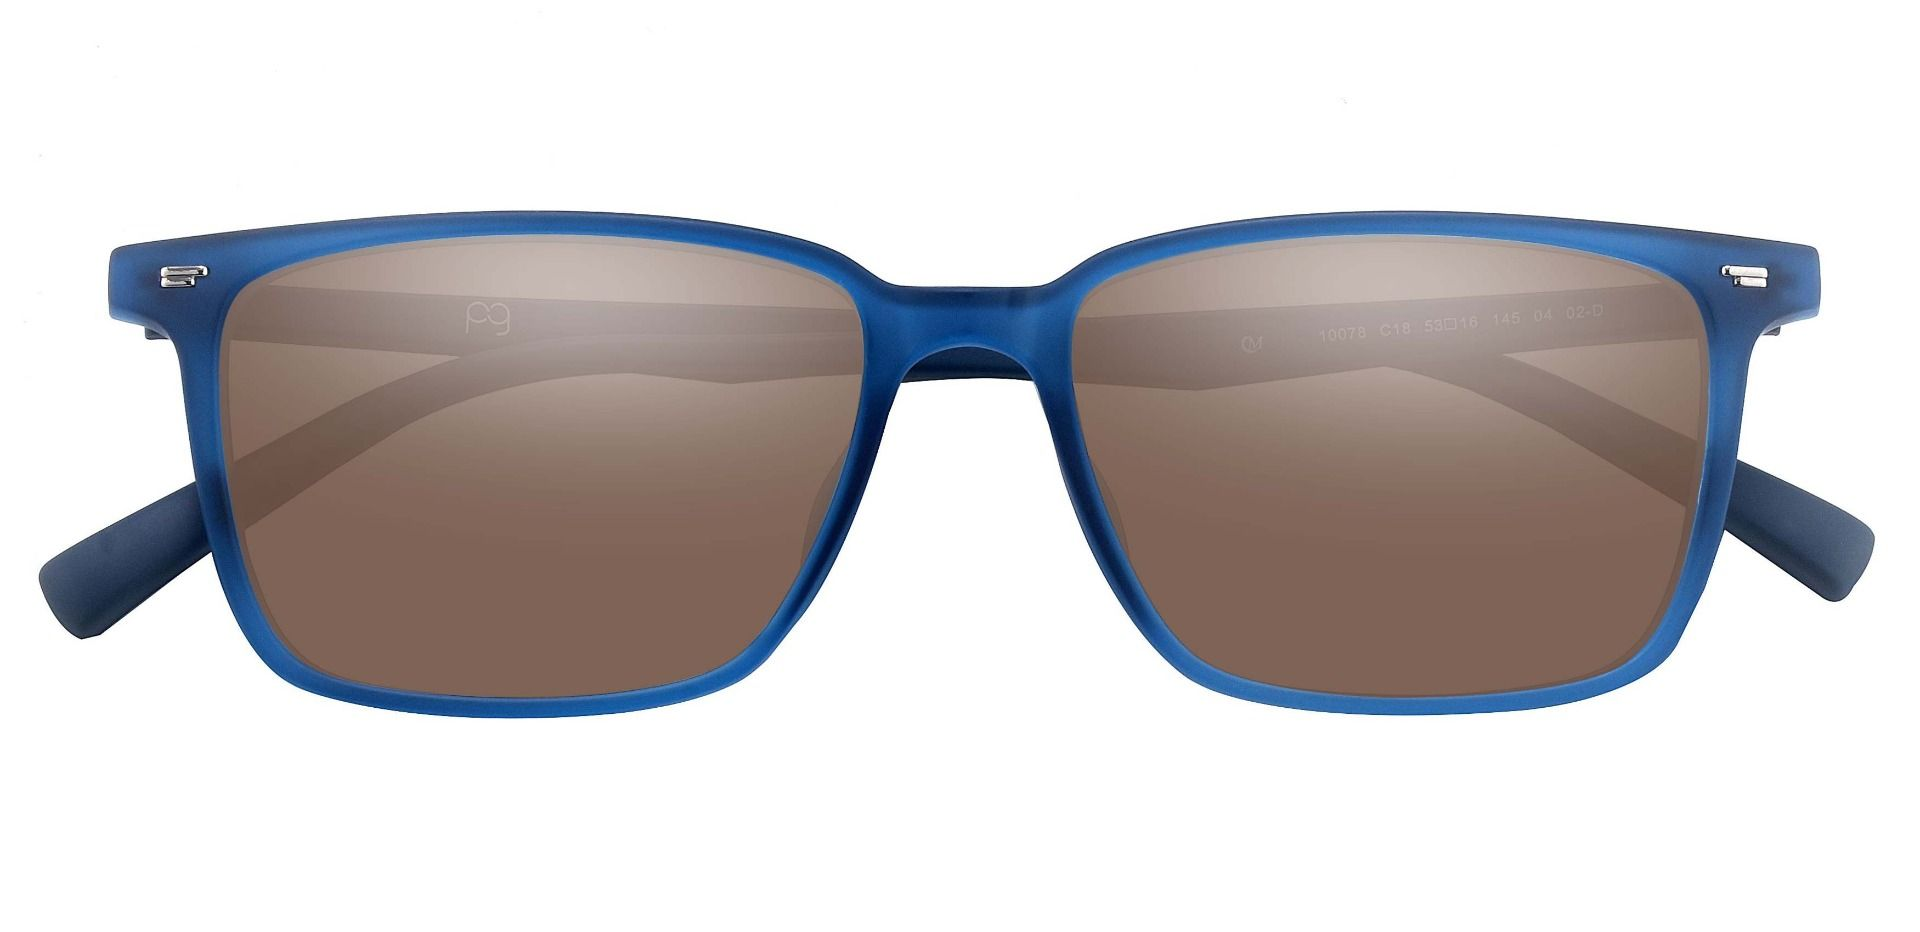 Sharona Rectangle Prescription Sunglasses - Blue Frame With Brown Lenses